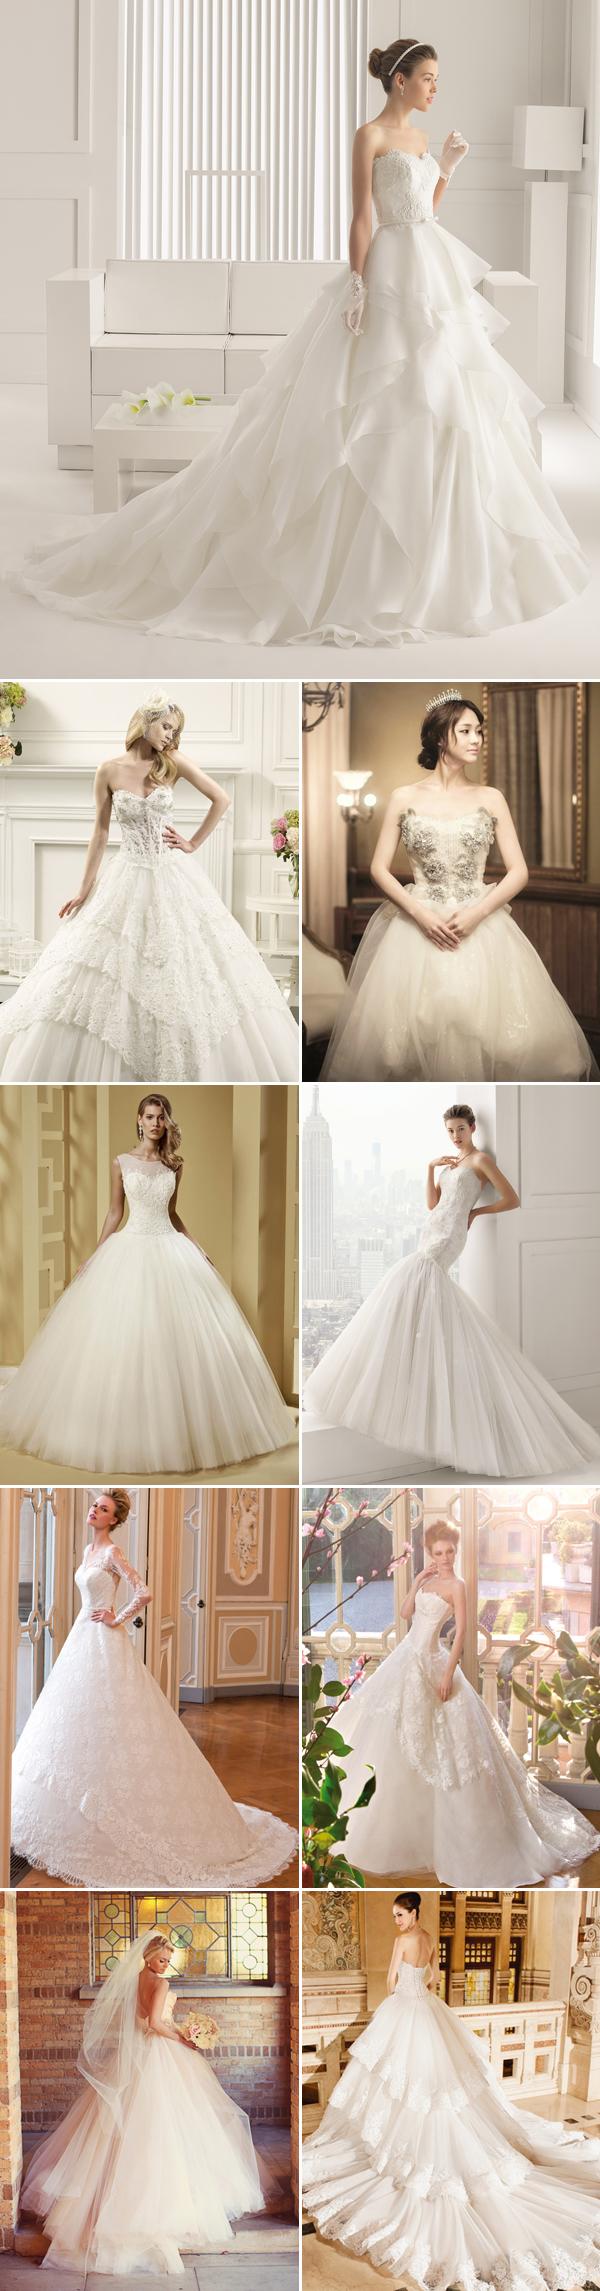 royalgown04-elegant